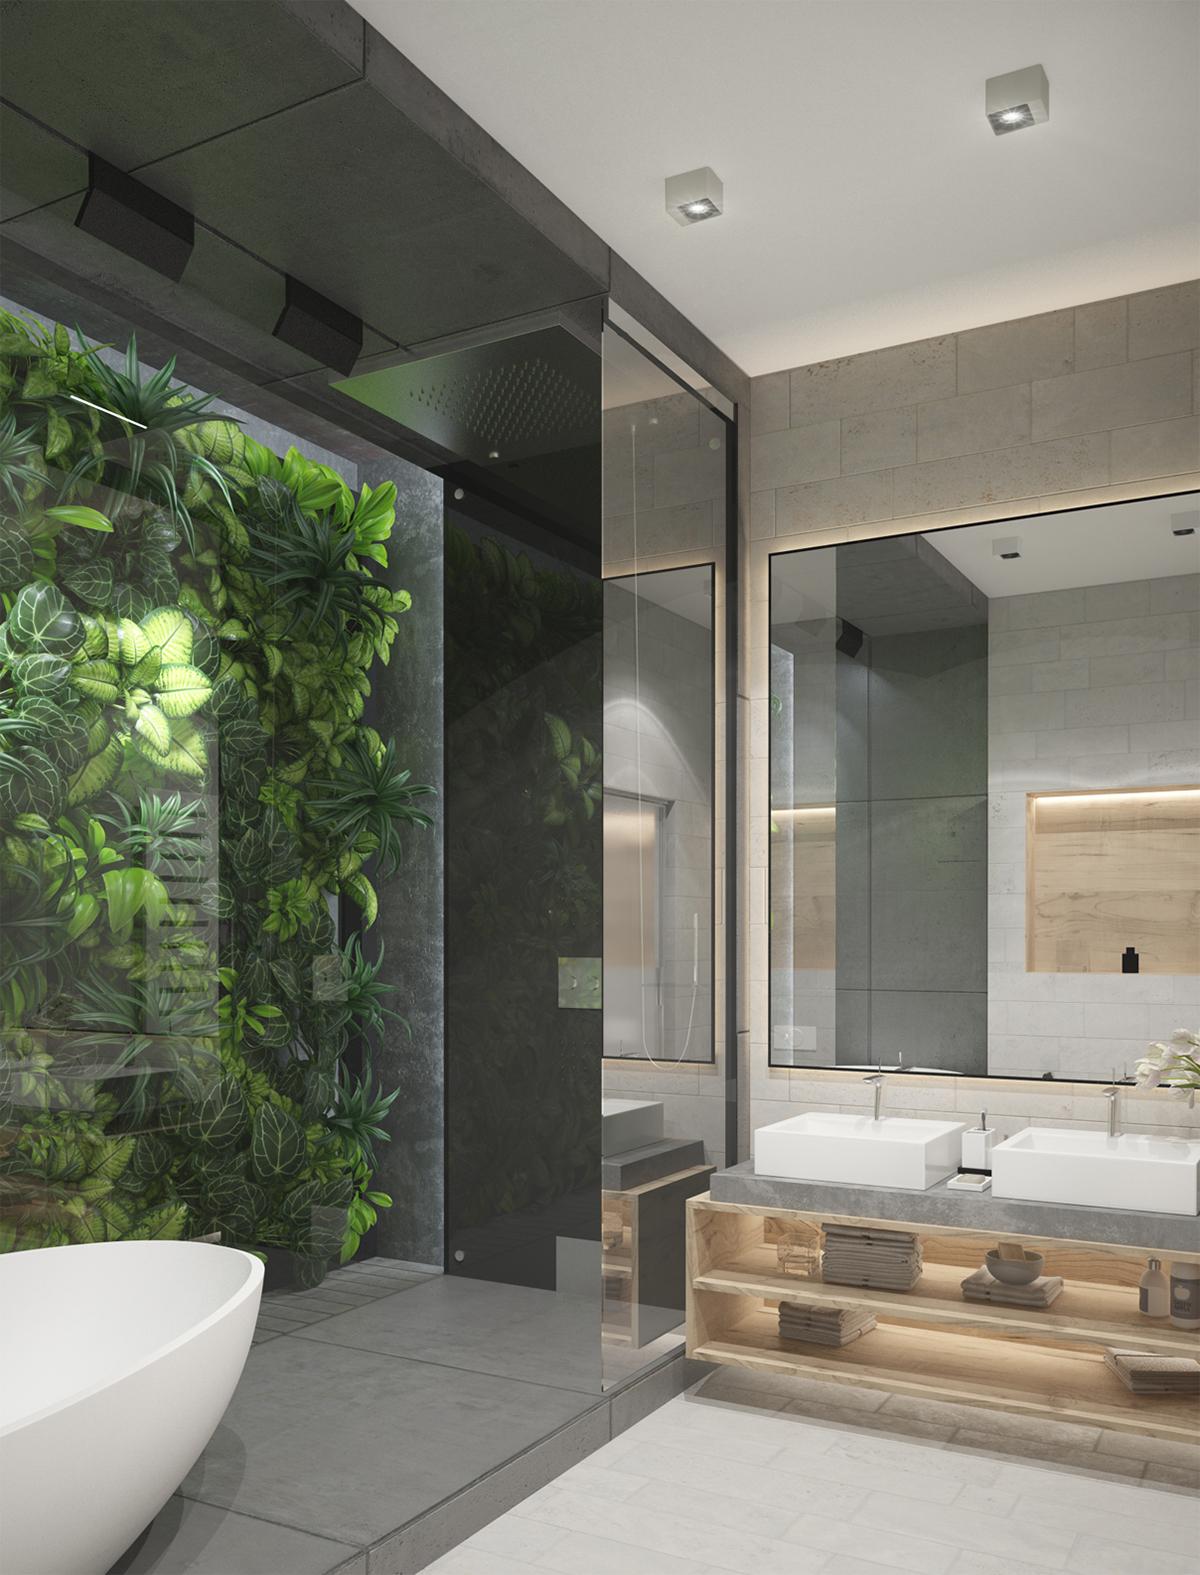 RAINFOREST BATHROOM on Behance